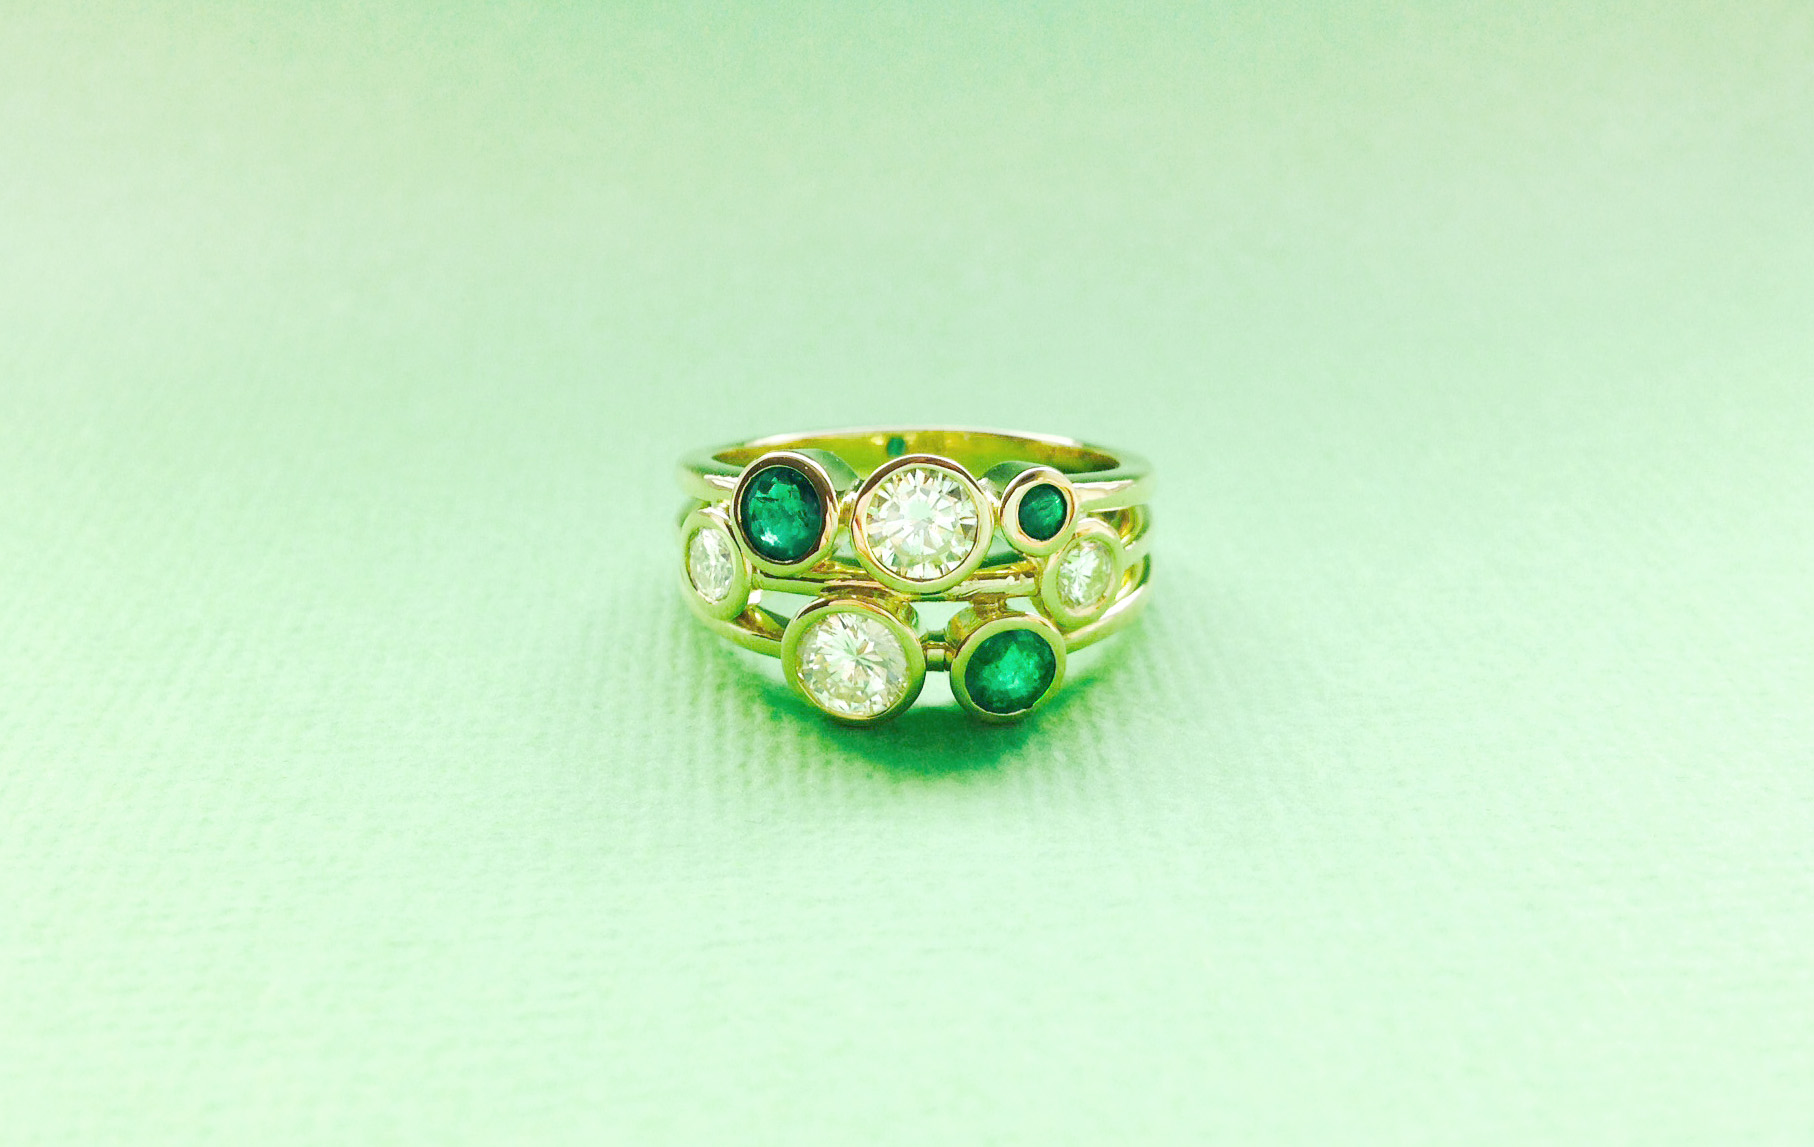 Bespoke Jewellery - unique emerald and diamond ring